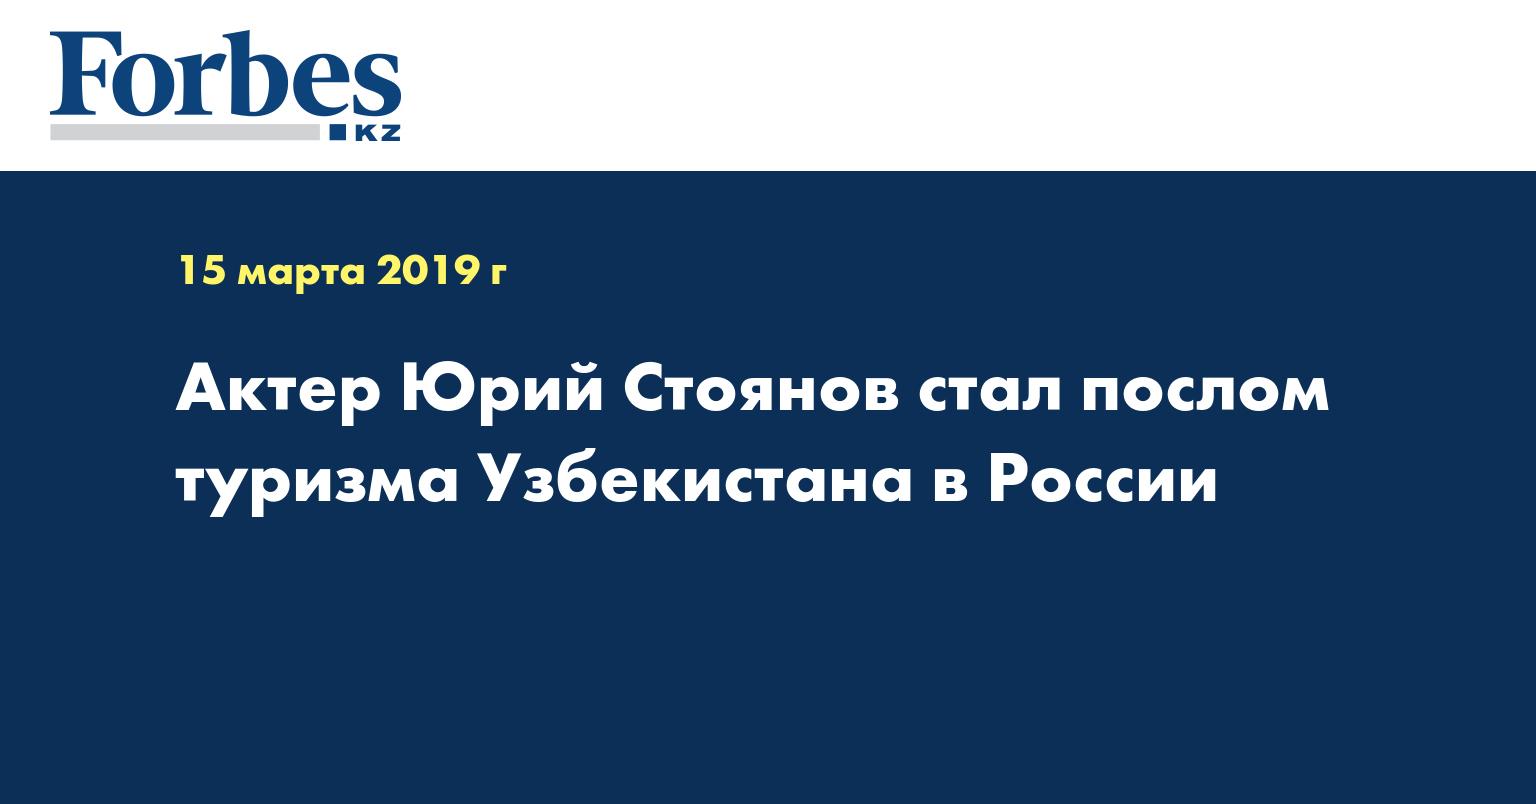 Актер Юрий Стоянов стал послом туризма Узбекистана в России